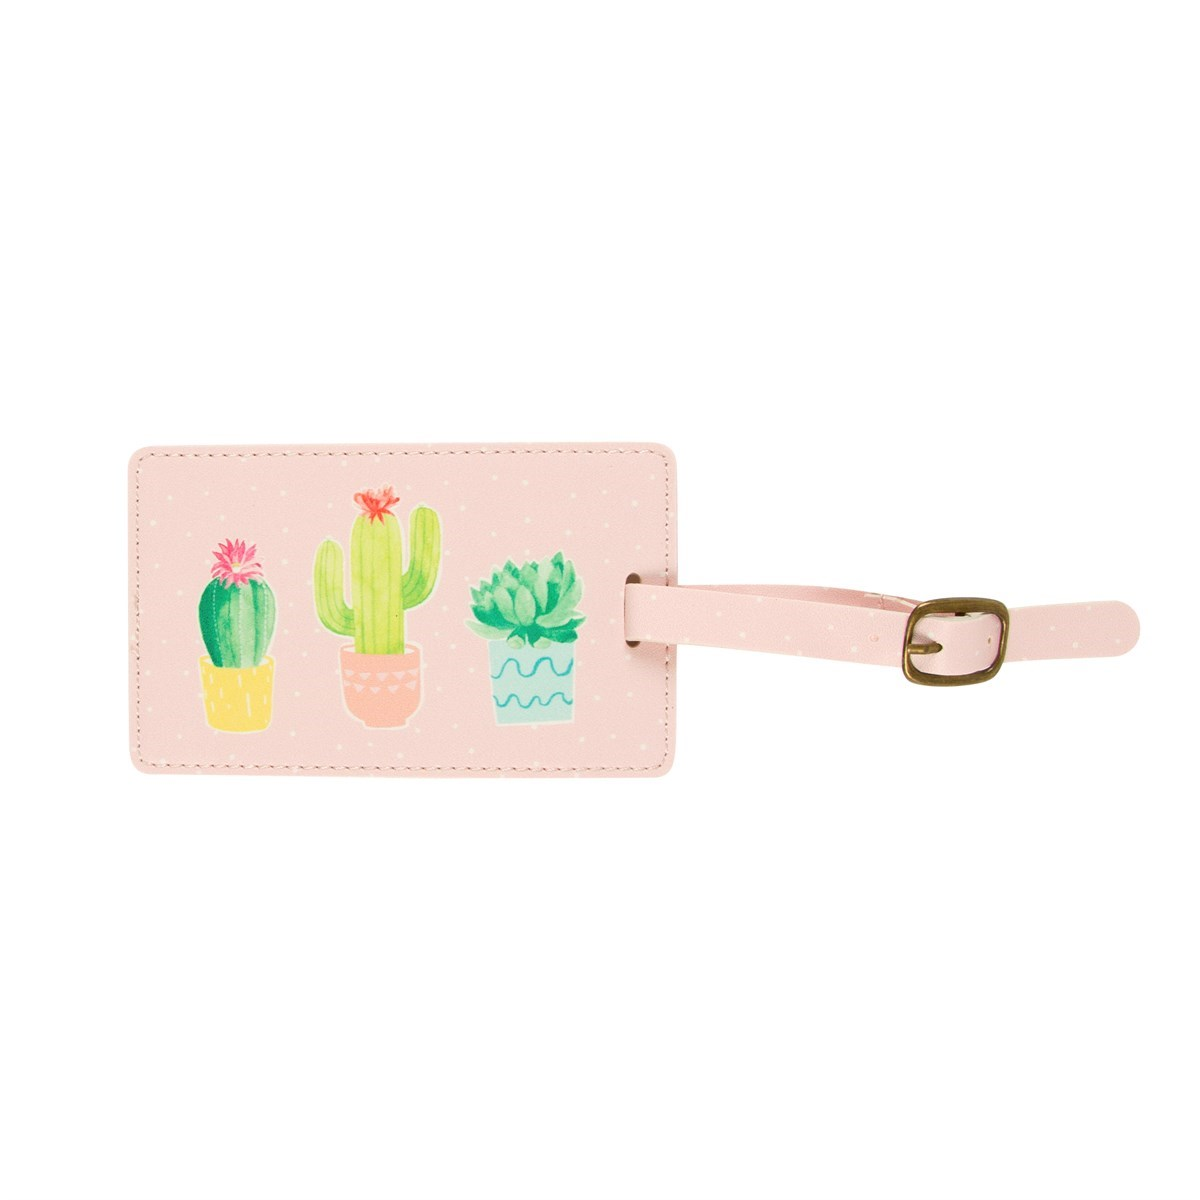 Visačka na zavazadlo Pastel Cactus_1